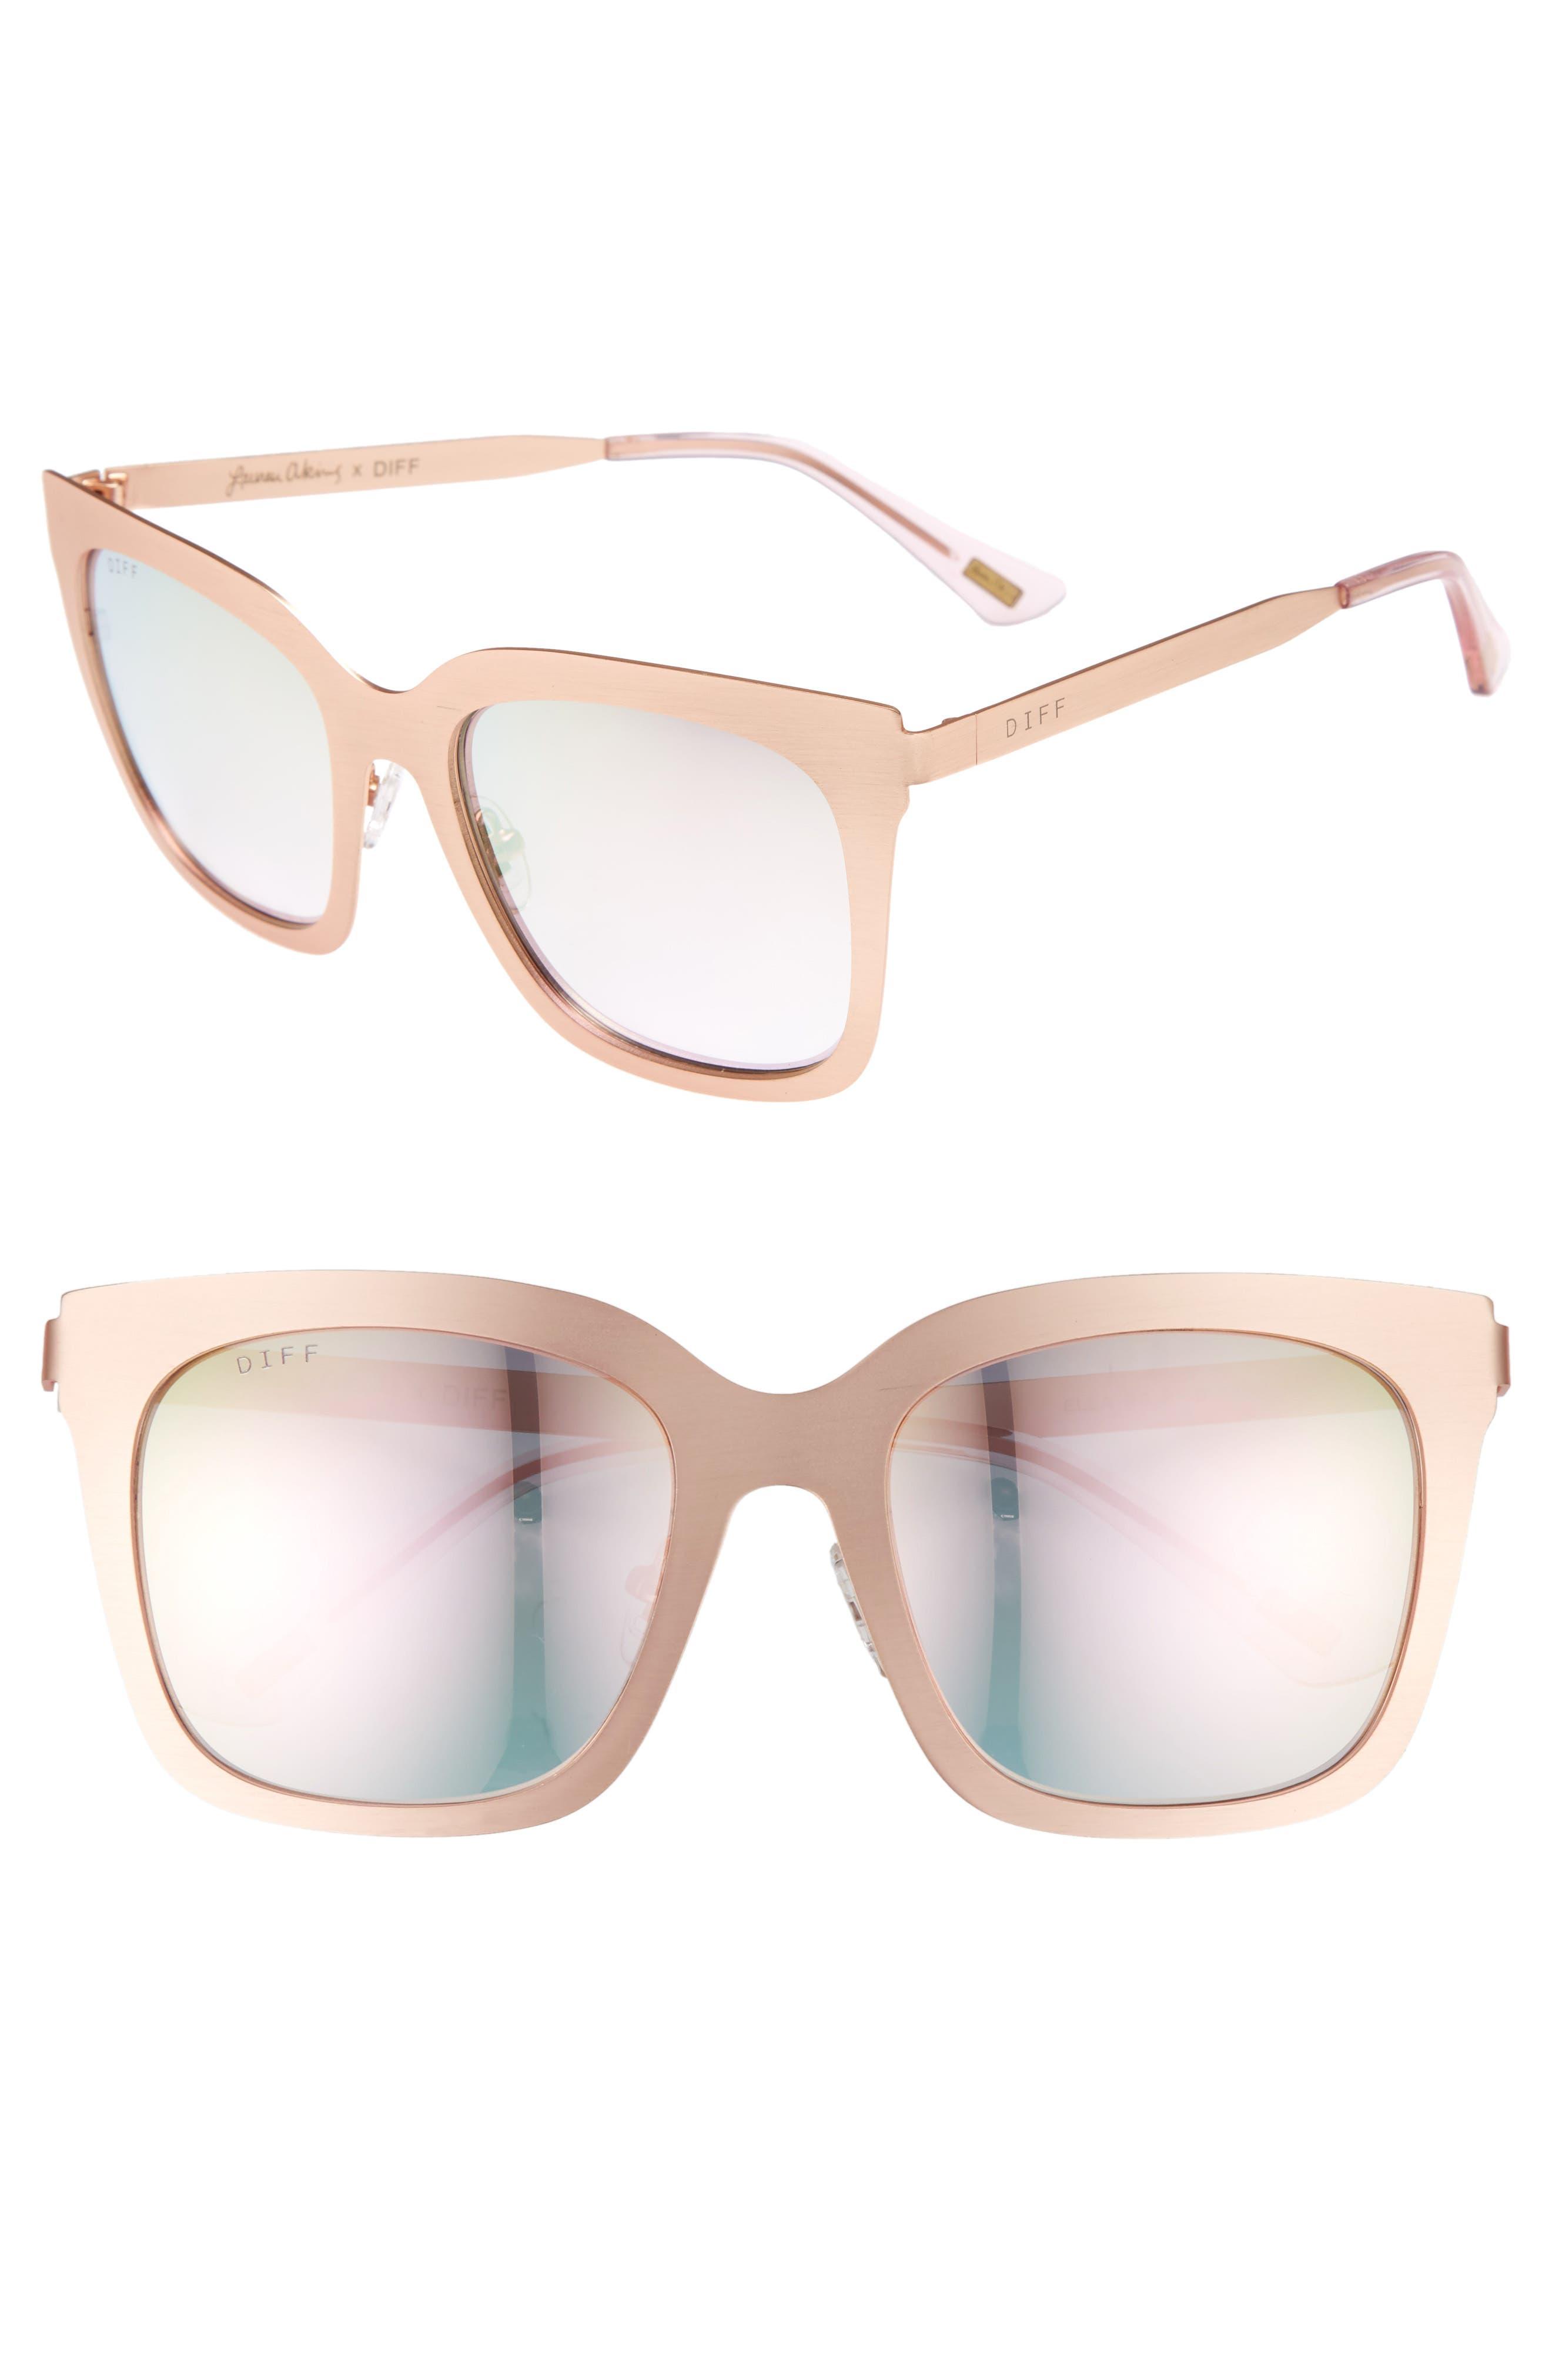 x Lauren Akins Ella 53mm Sunglasses,                             Main thumbnail 1, color,                             Rose Gold/ Pink